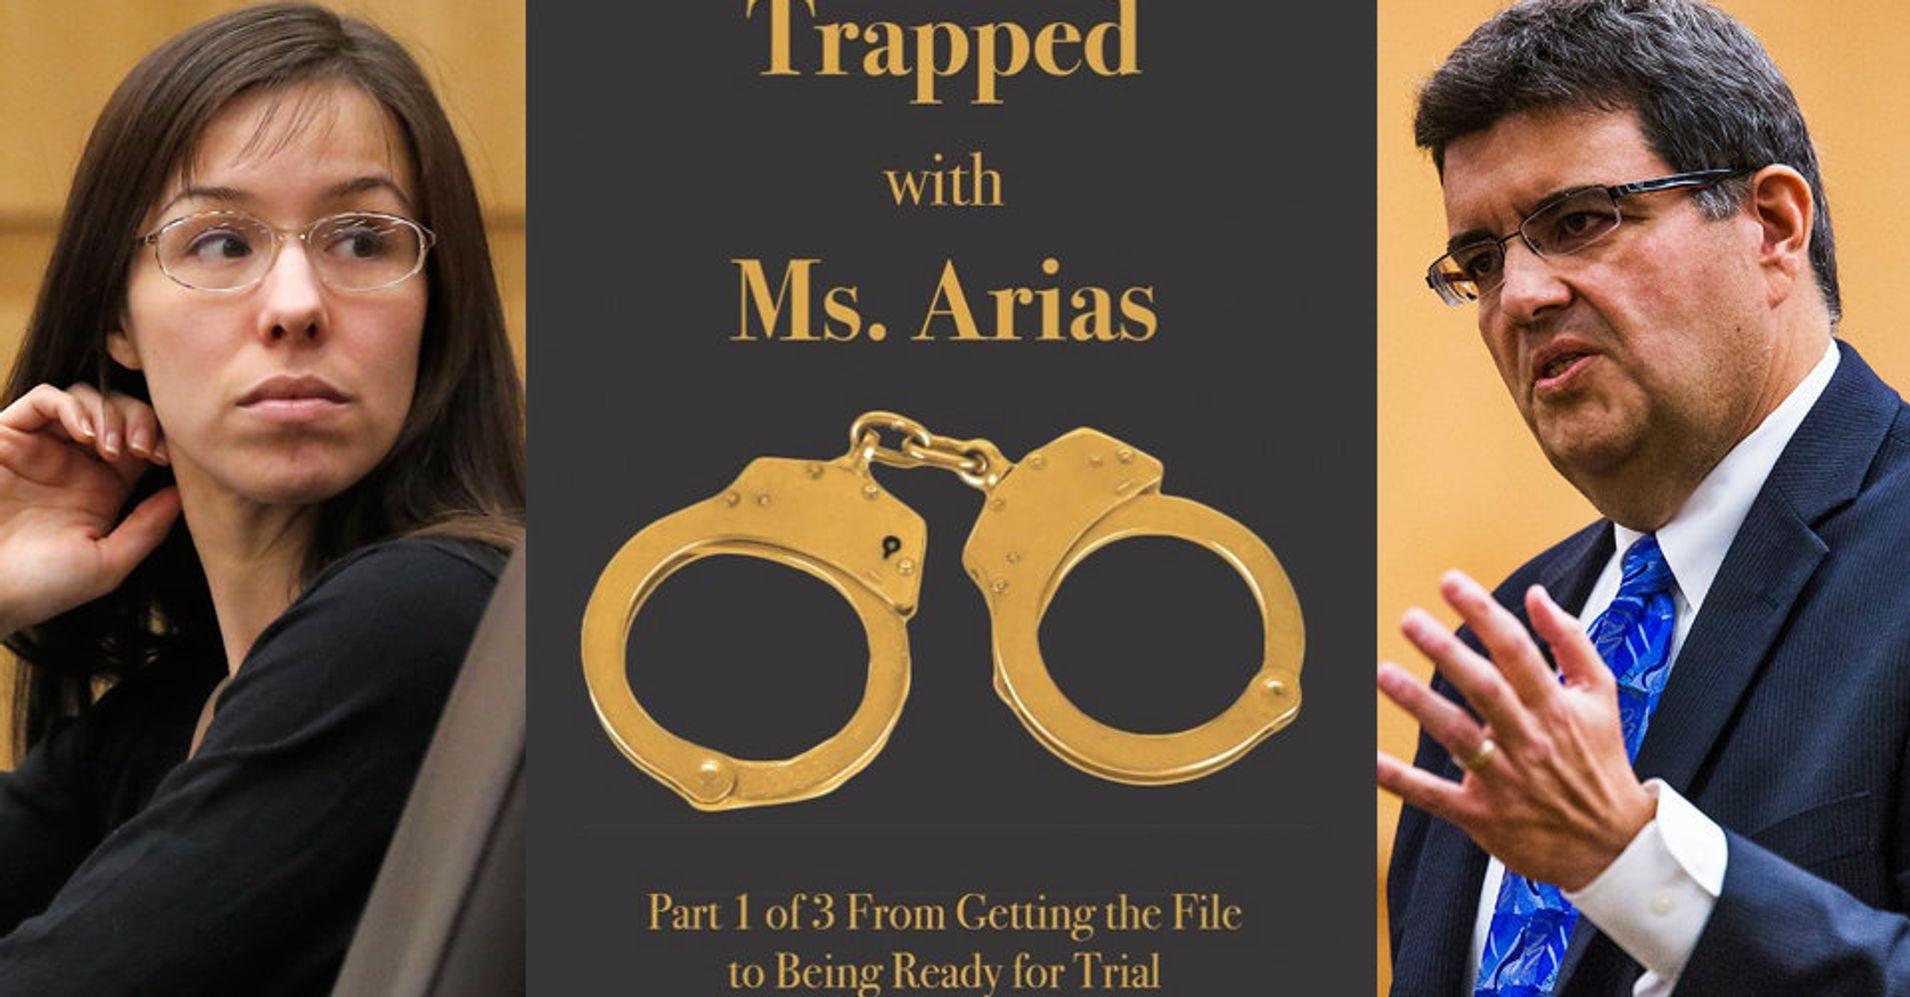 Juan martinez prosecuting attorney biography - Jodi Arias Ex Lawyer Blasts Convicted Murderer S Sexual Escapades Huffpost